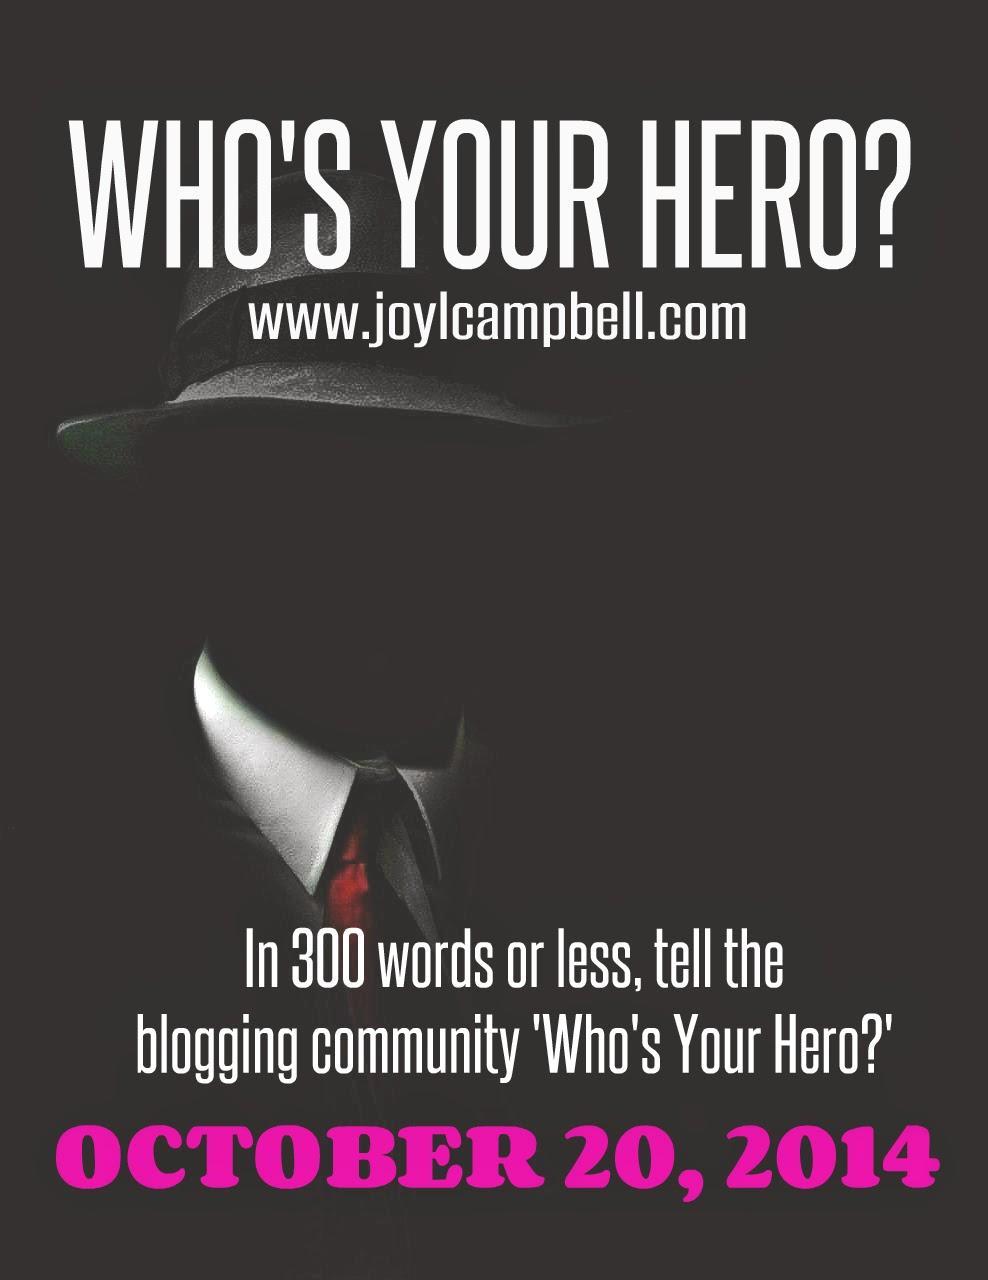 2014 Blogfest